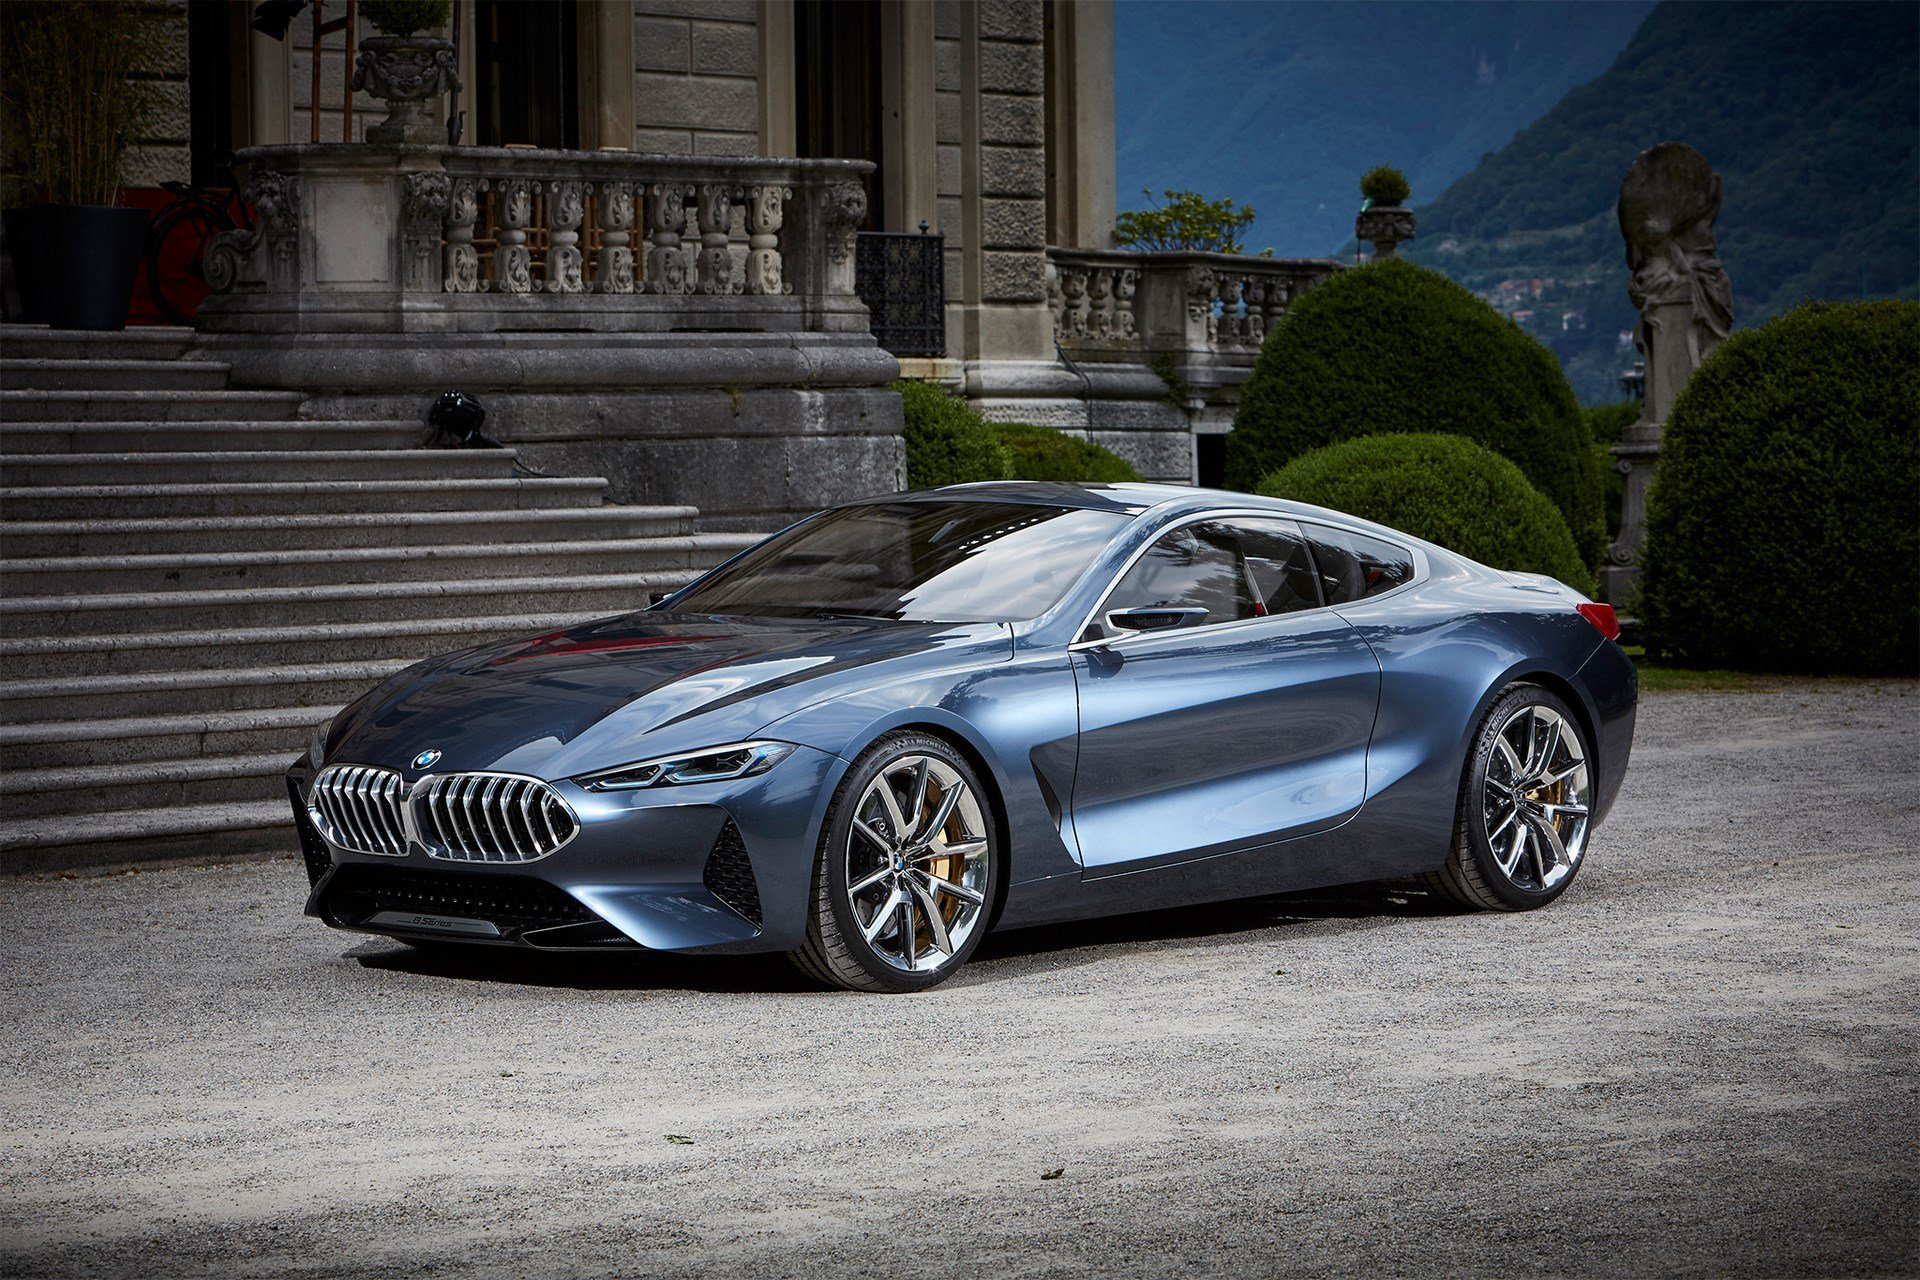 BMW serii 8 Concept